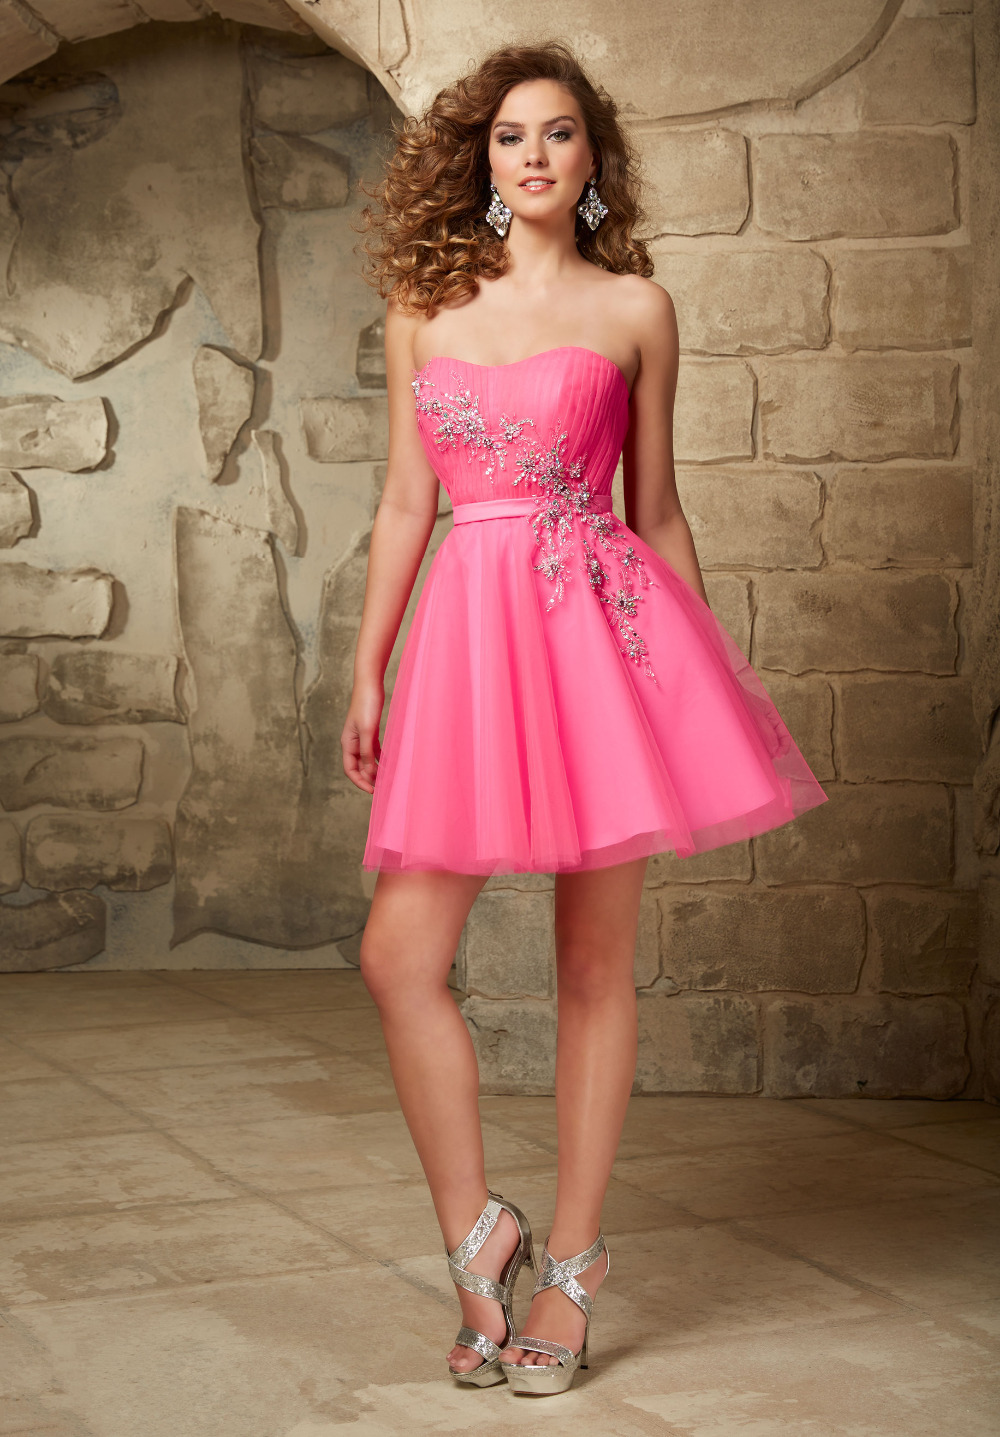 Hot Pink Puffy Purple Short Homecoming Dresses 2015 8th Grade Prom Dresses Mini Teen Formal